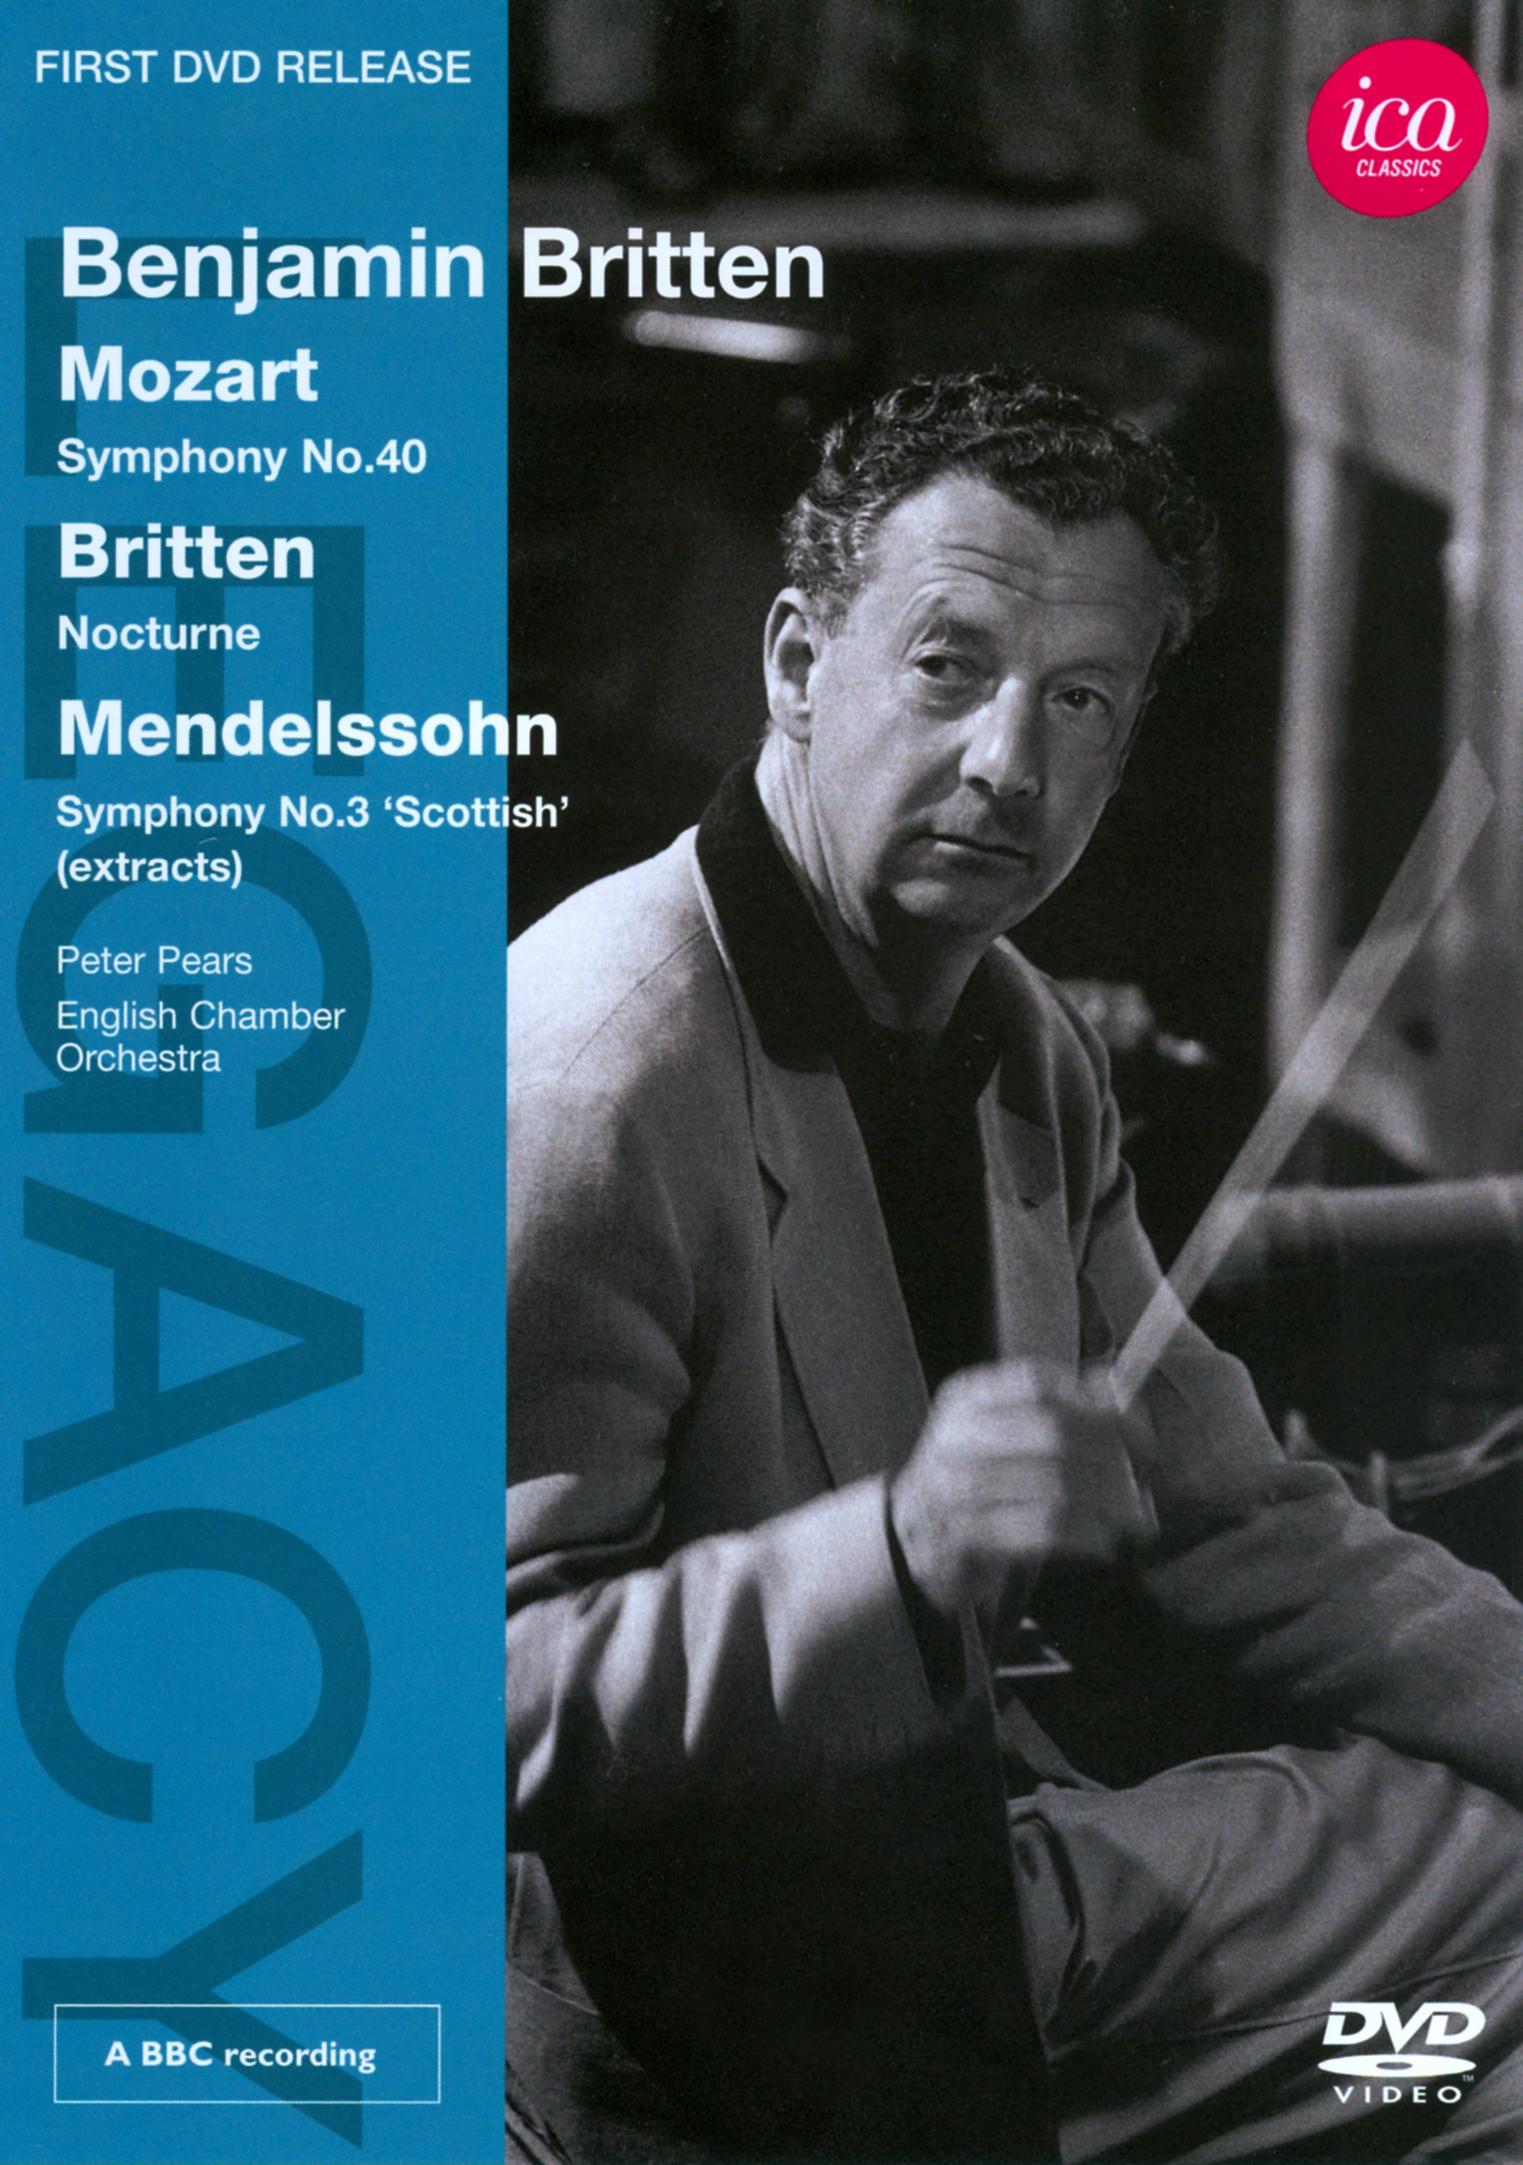 Benjamin Britten/English Chamber Orchestra: Mozart/Britten/Mendelssohn